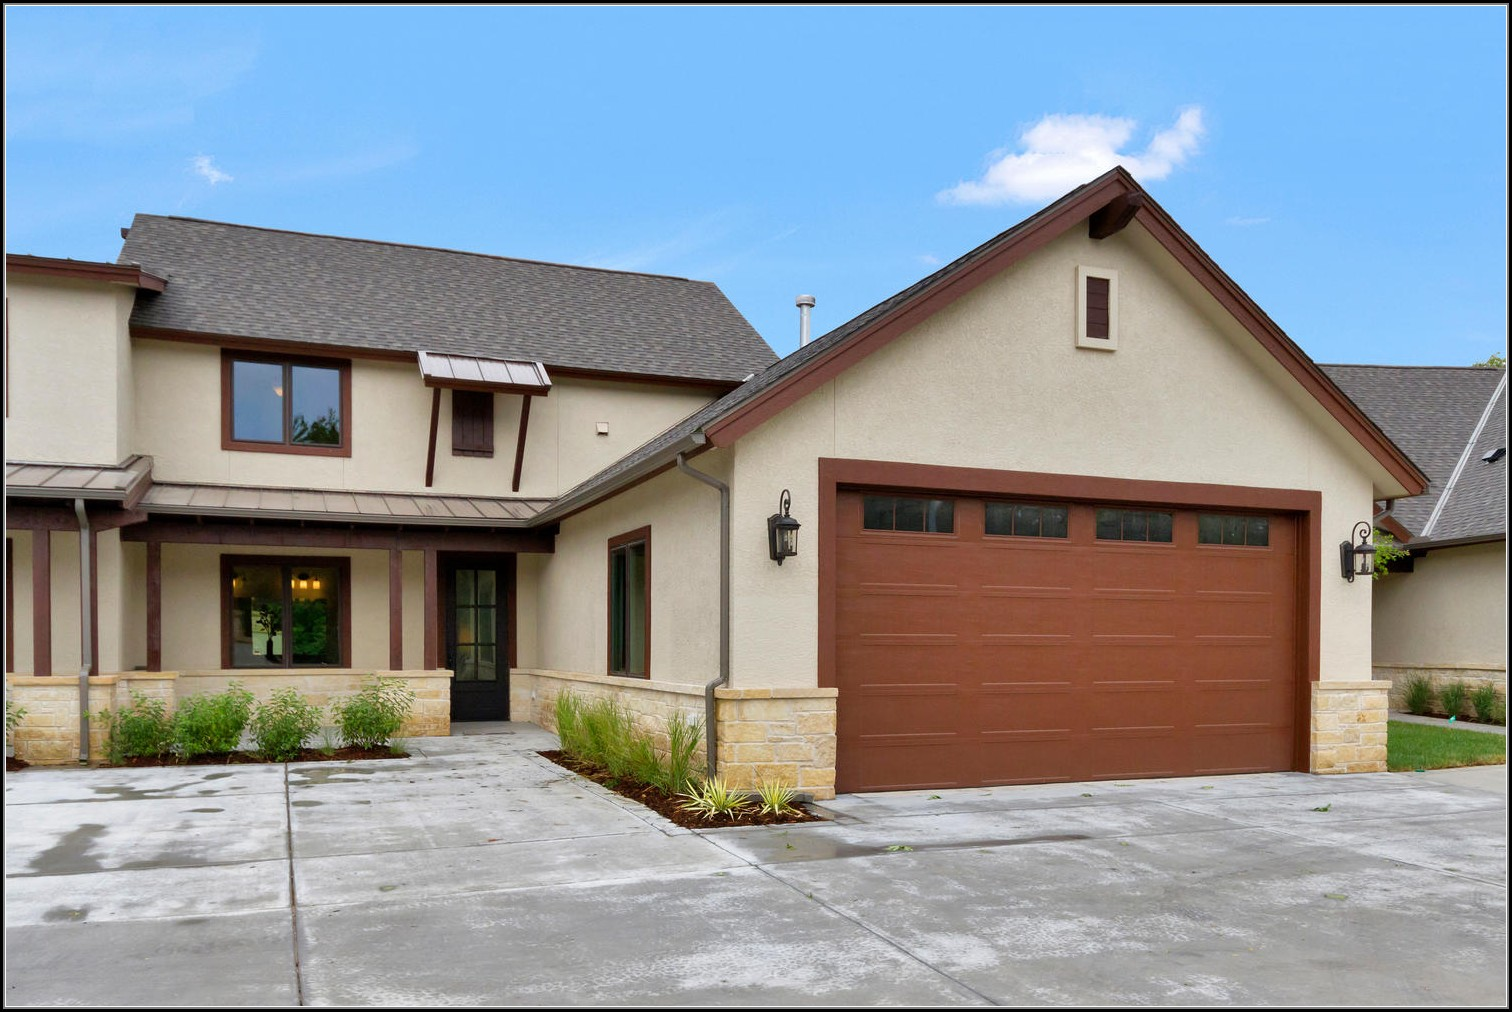 Frontgate Patio Homes Wichita Ks